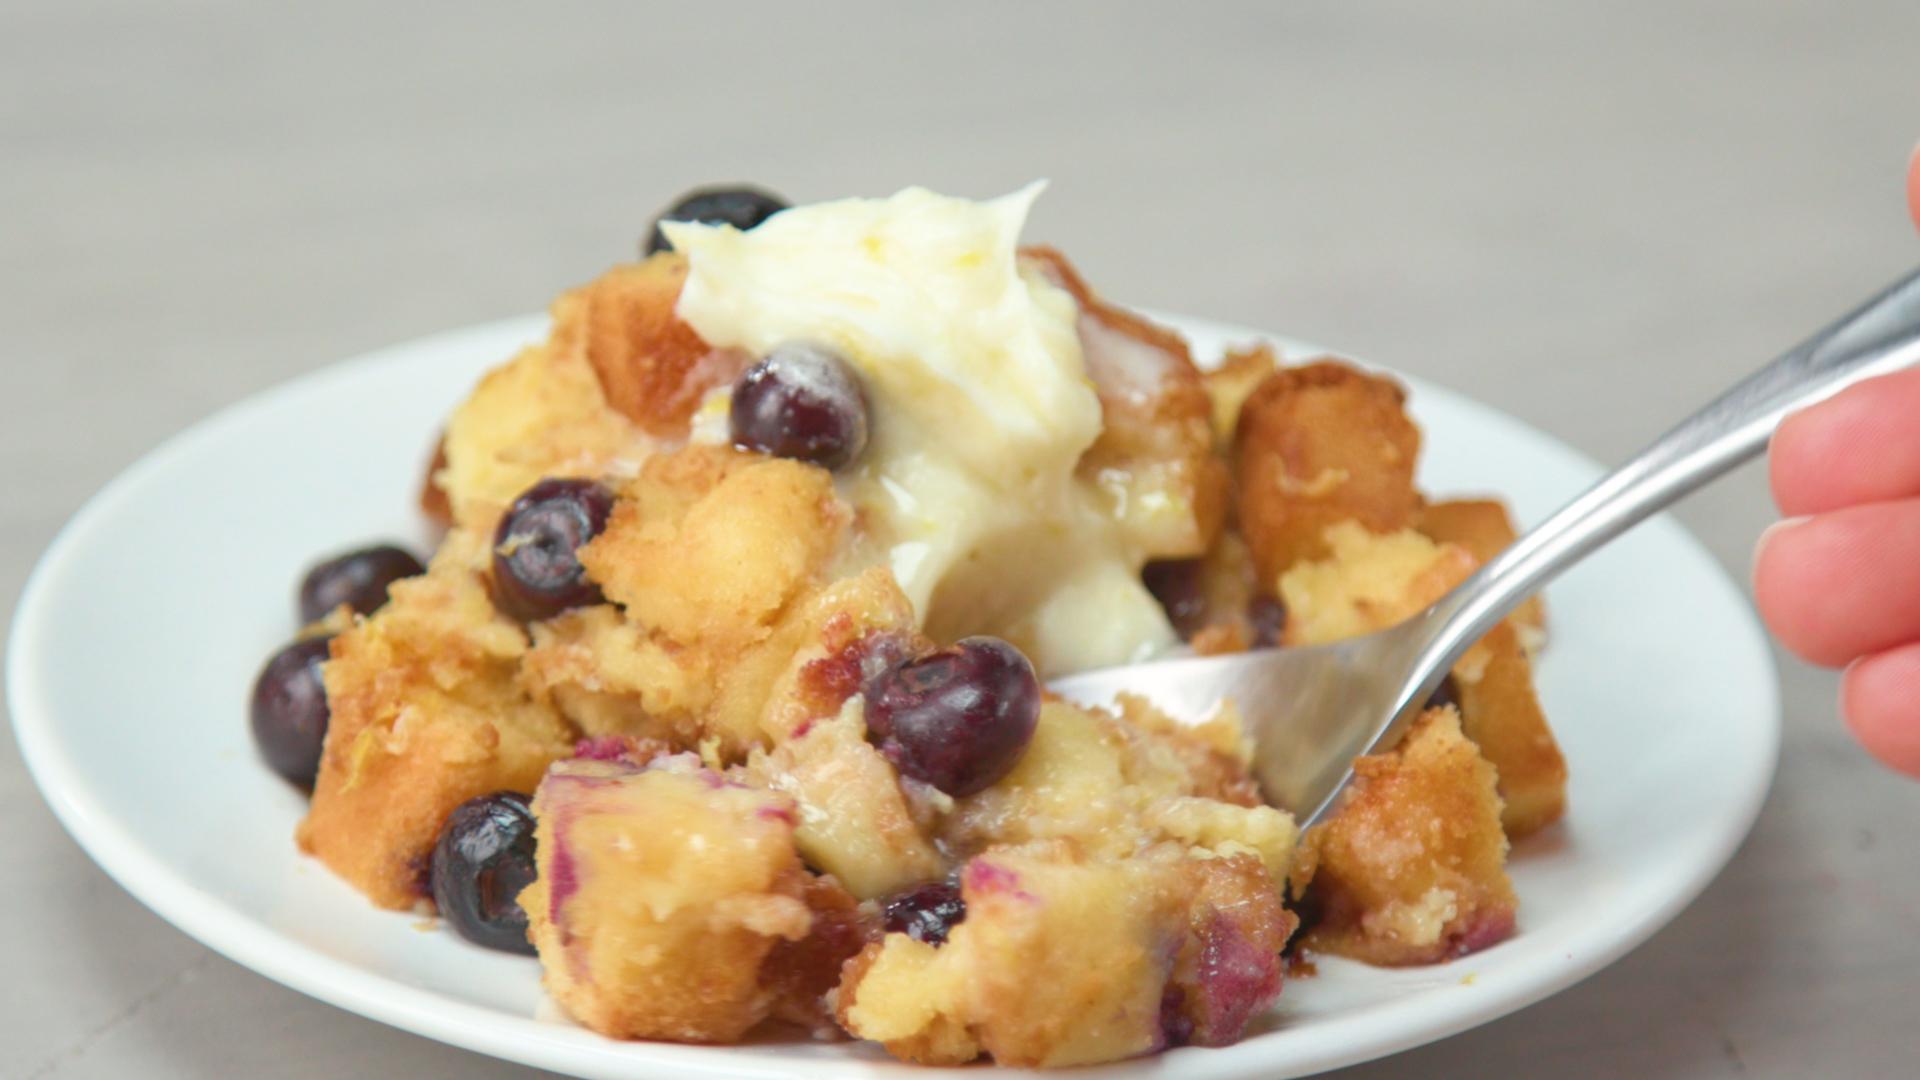 Blueberry Bread Pudding with Lemon Hard Sauce STILL.jpg